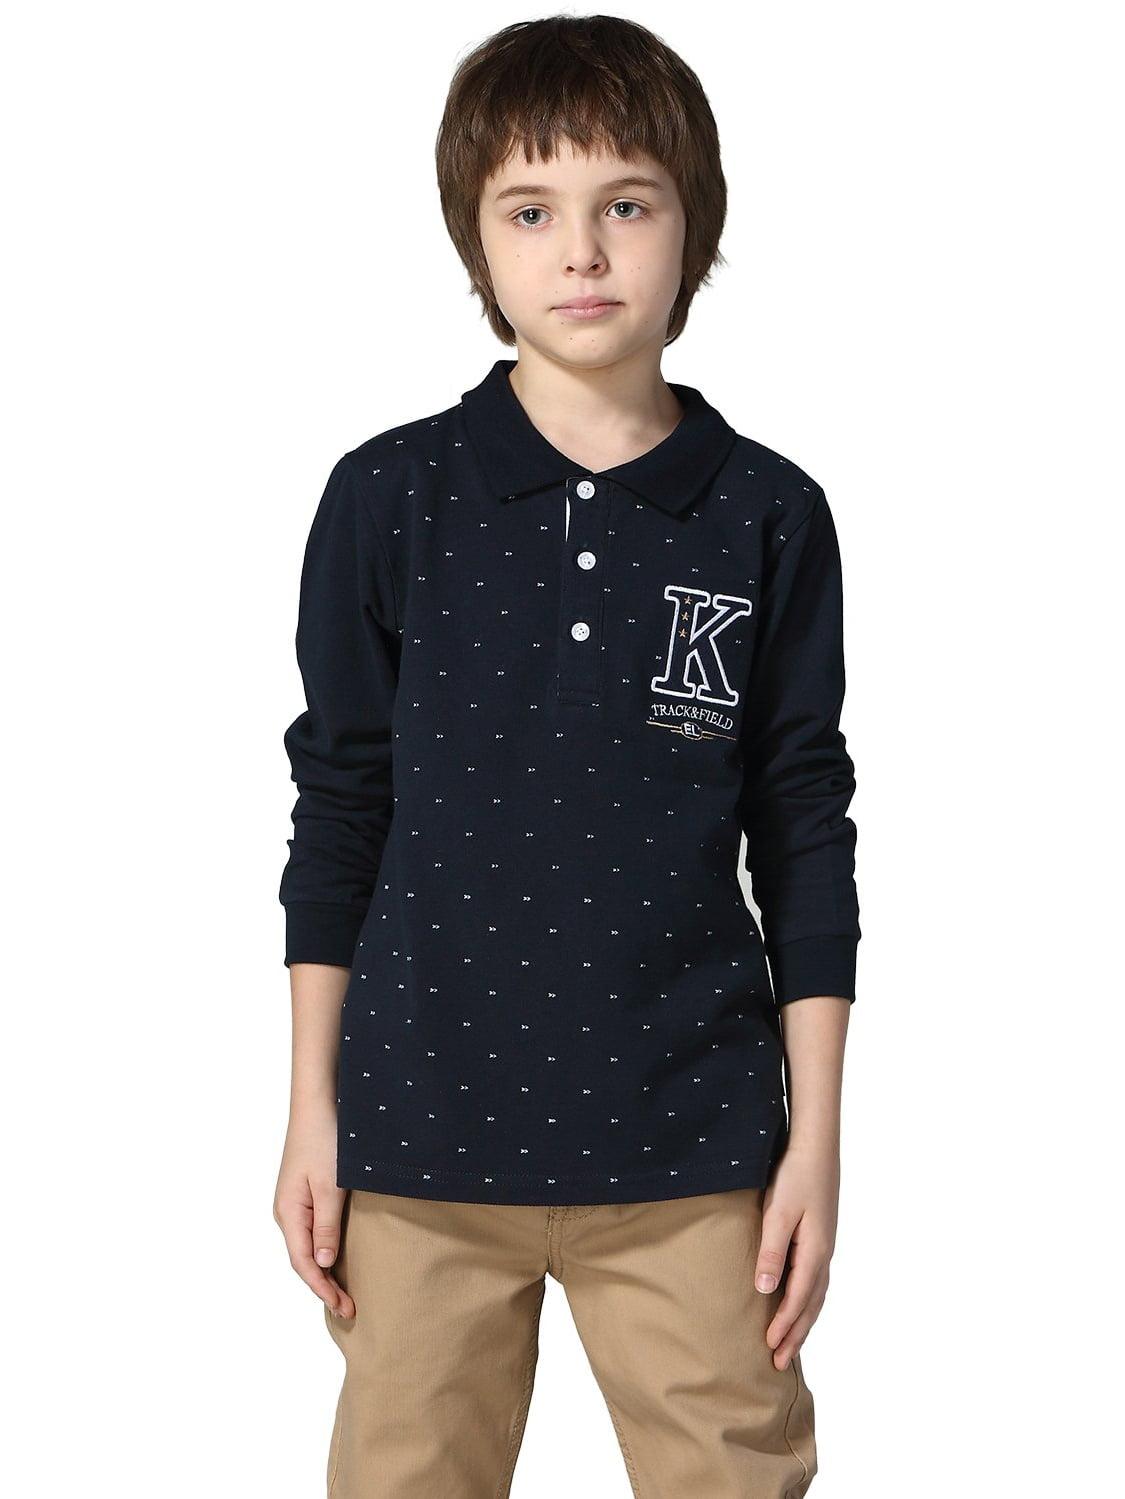 Leo&Lily Boys Long Sleeves Print Polo Shirts T-Shirt